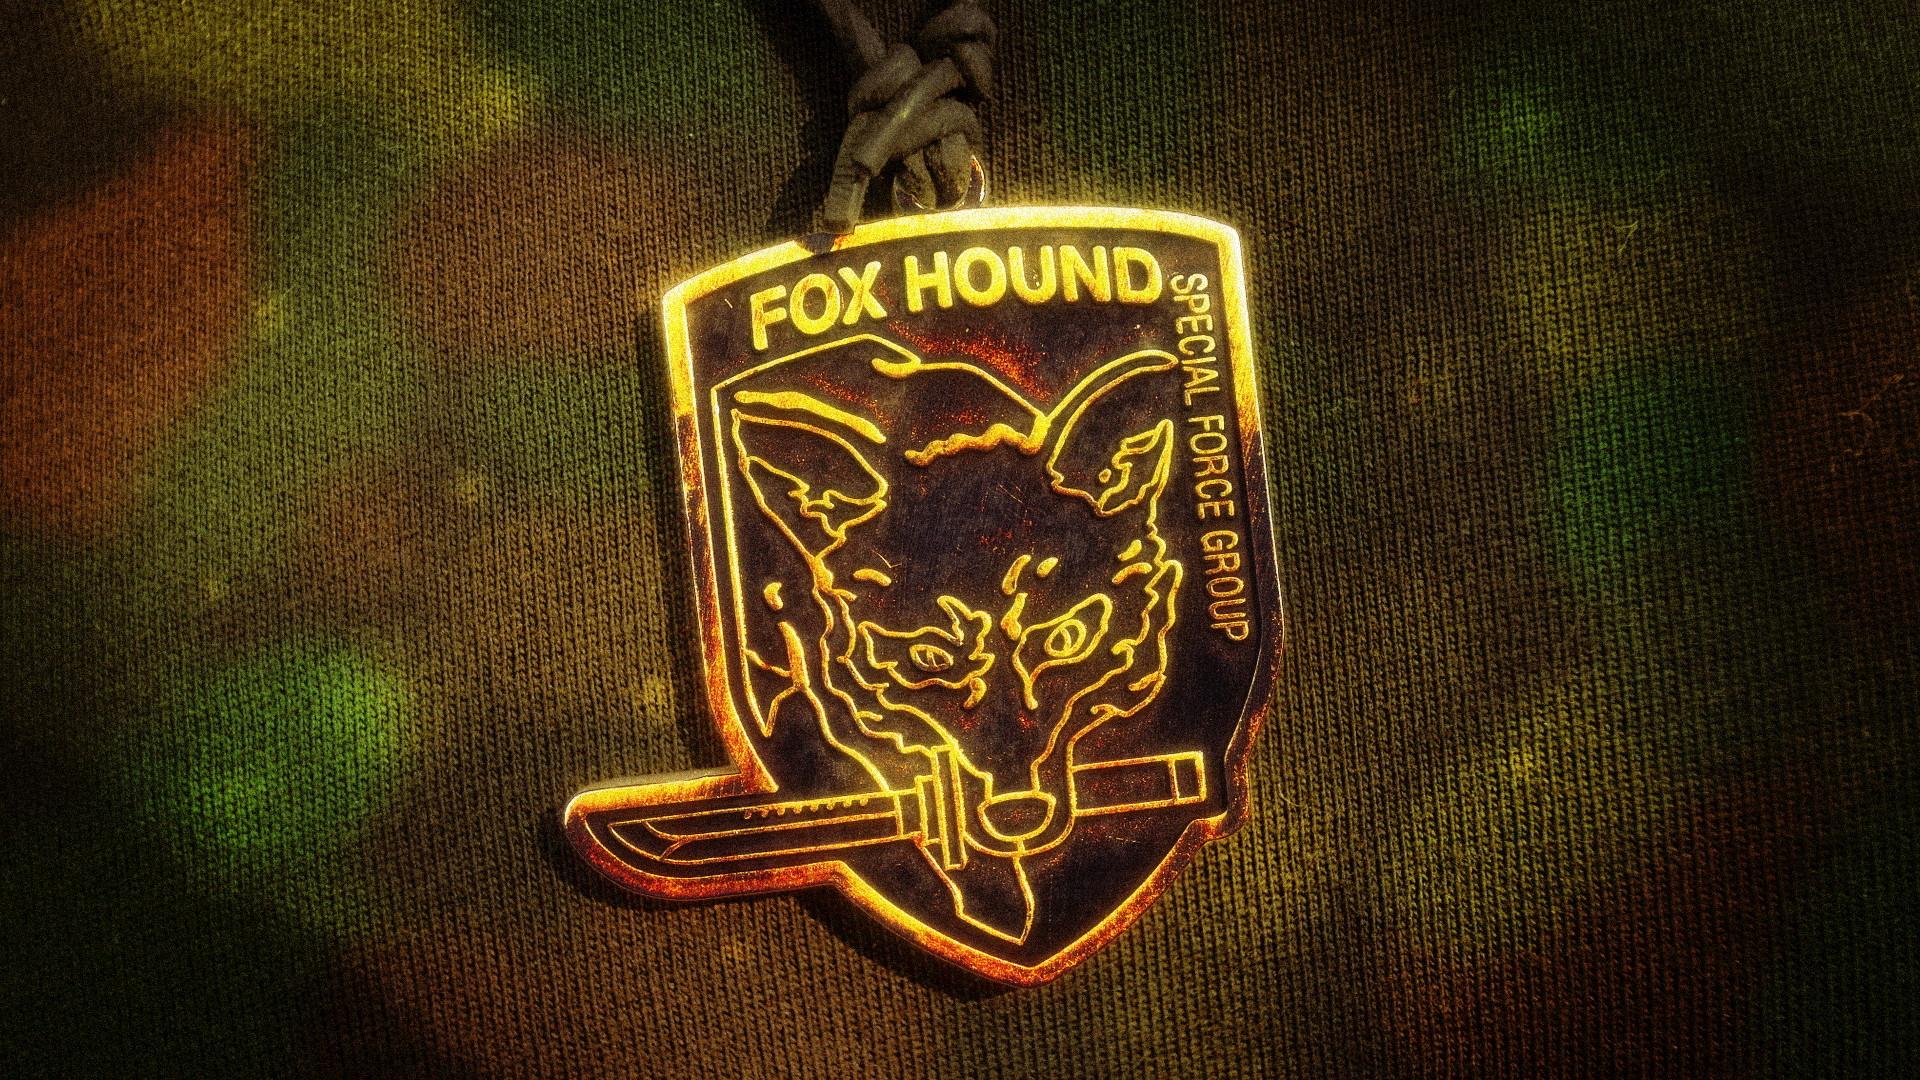 … Fox Hound Pendant Camo Wallpaper by nxsvinyard